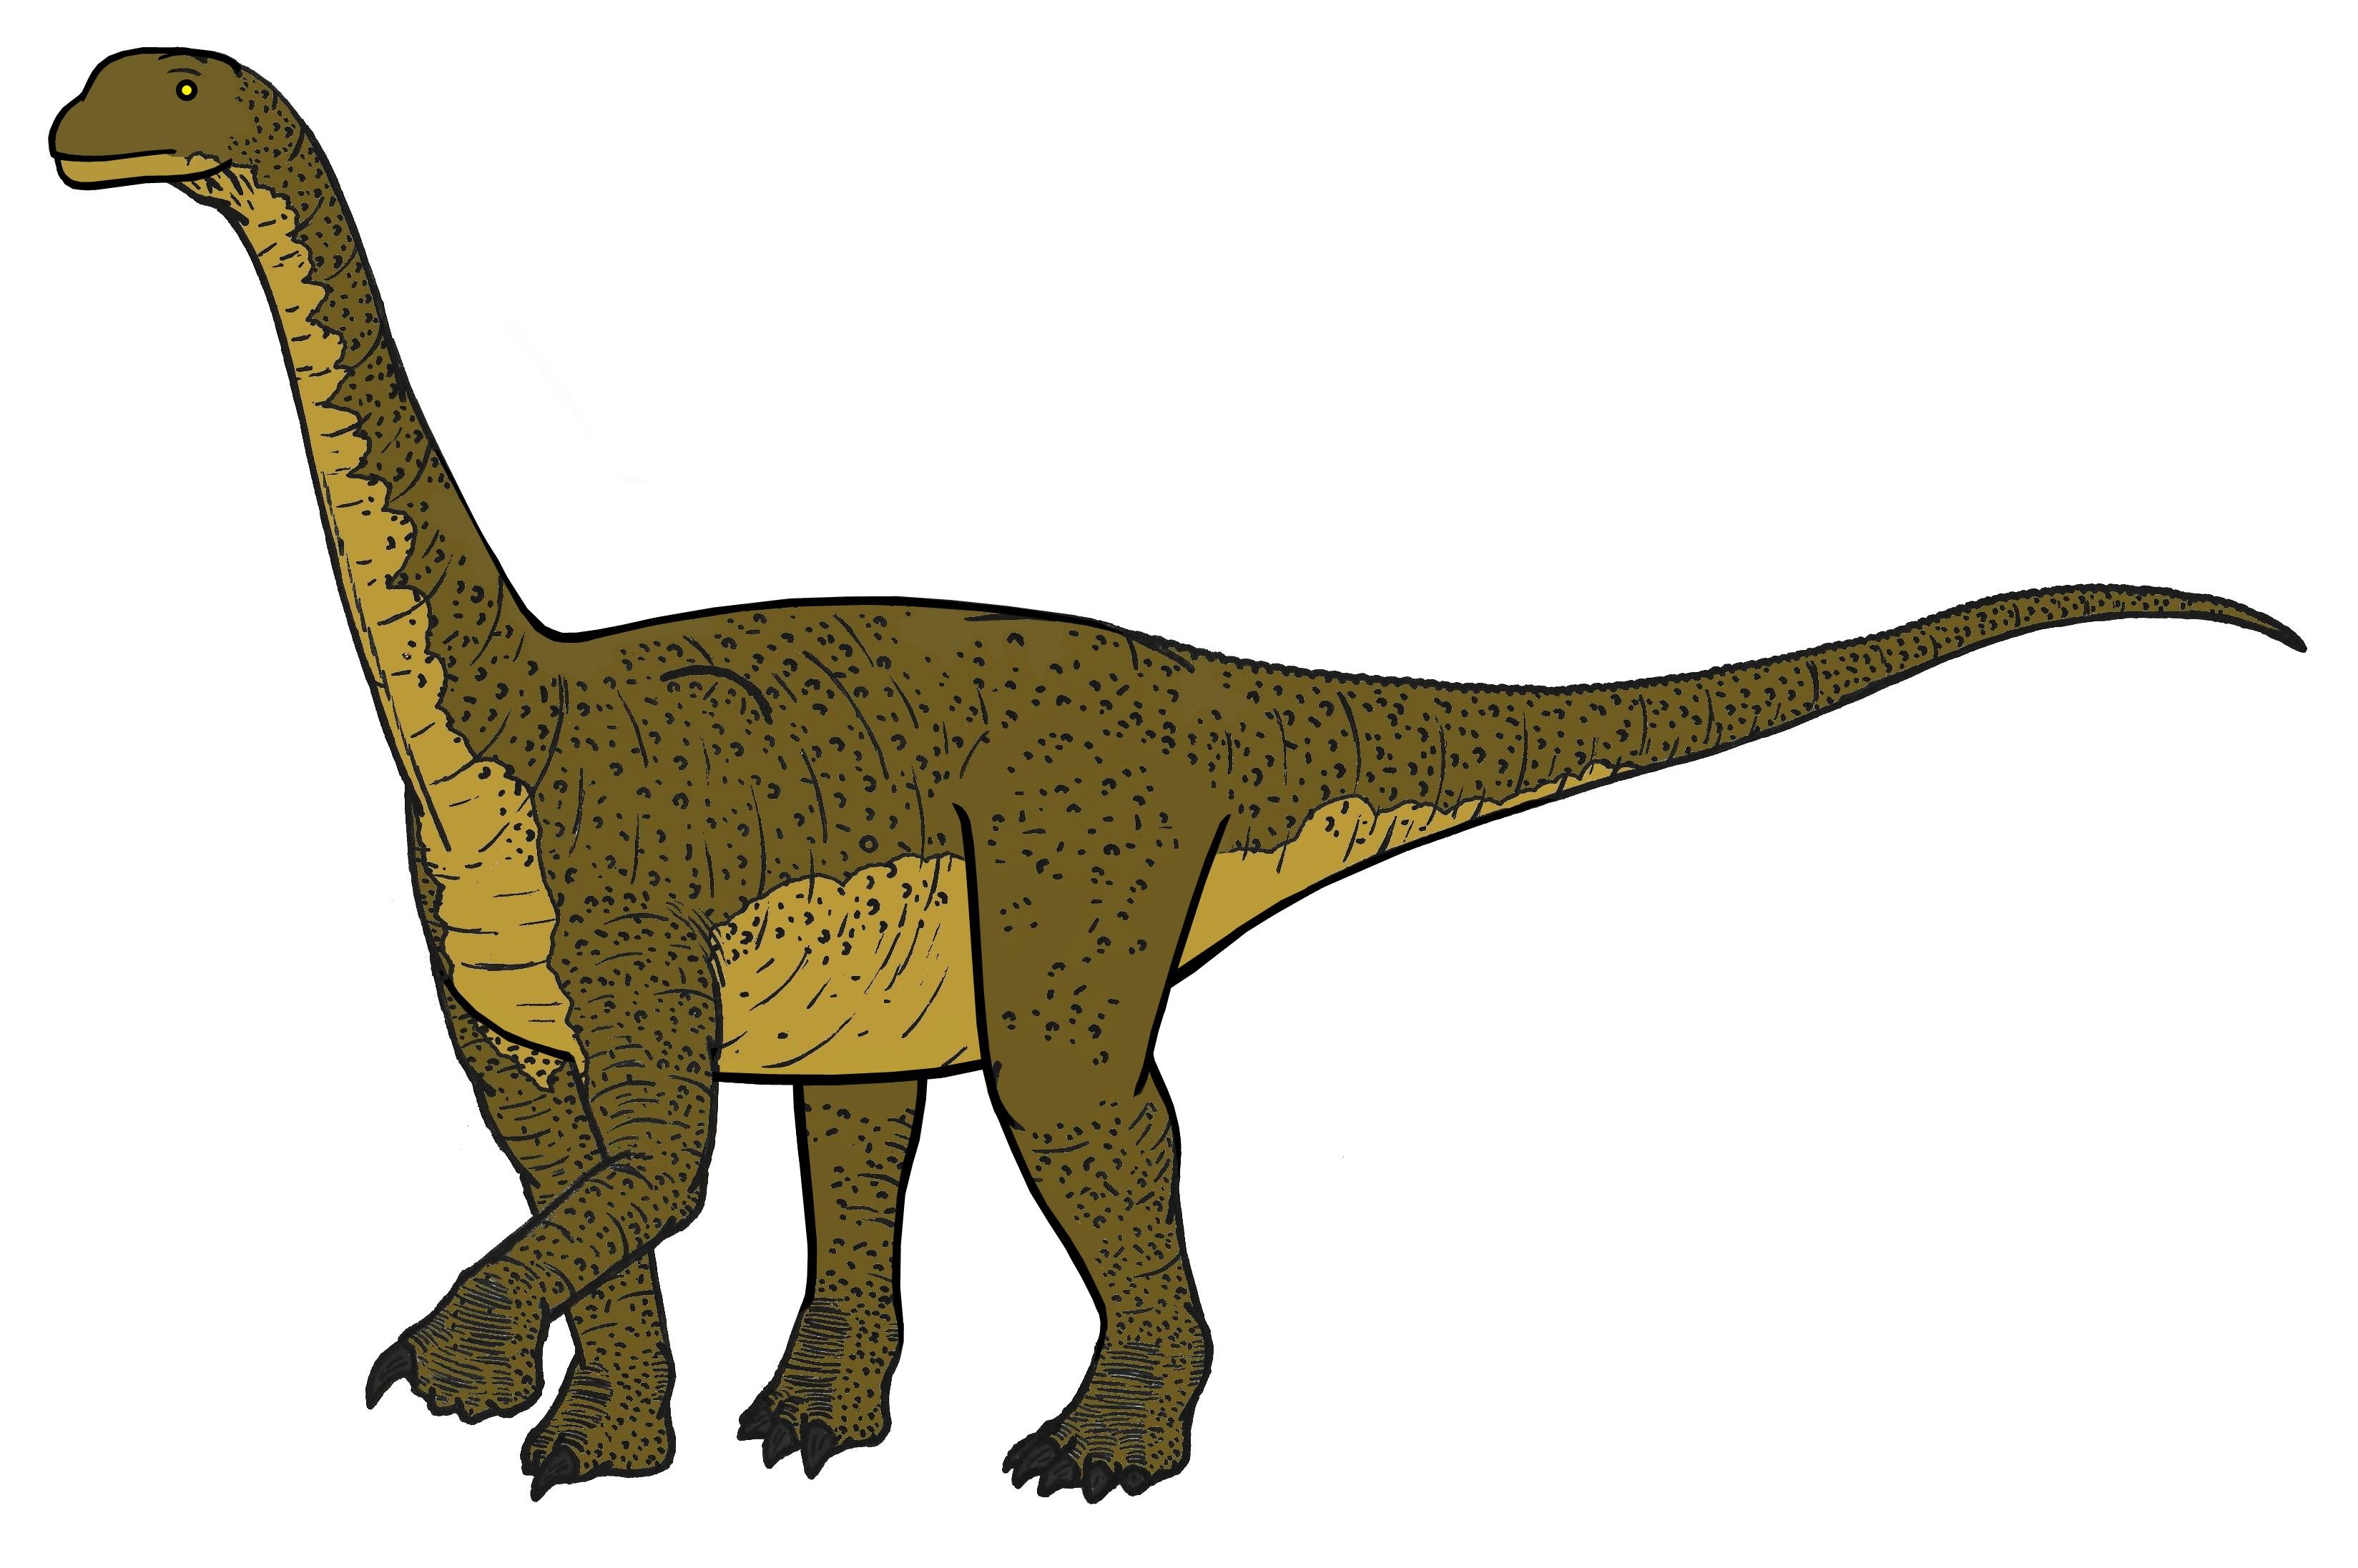 File:Camarasaurus 05874.JPG - Wikipedia, the free encyclopedia